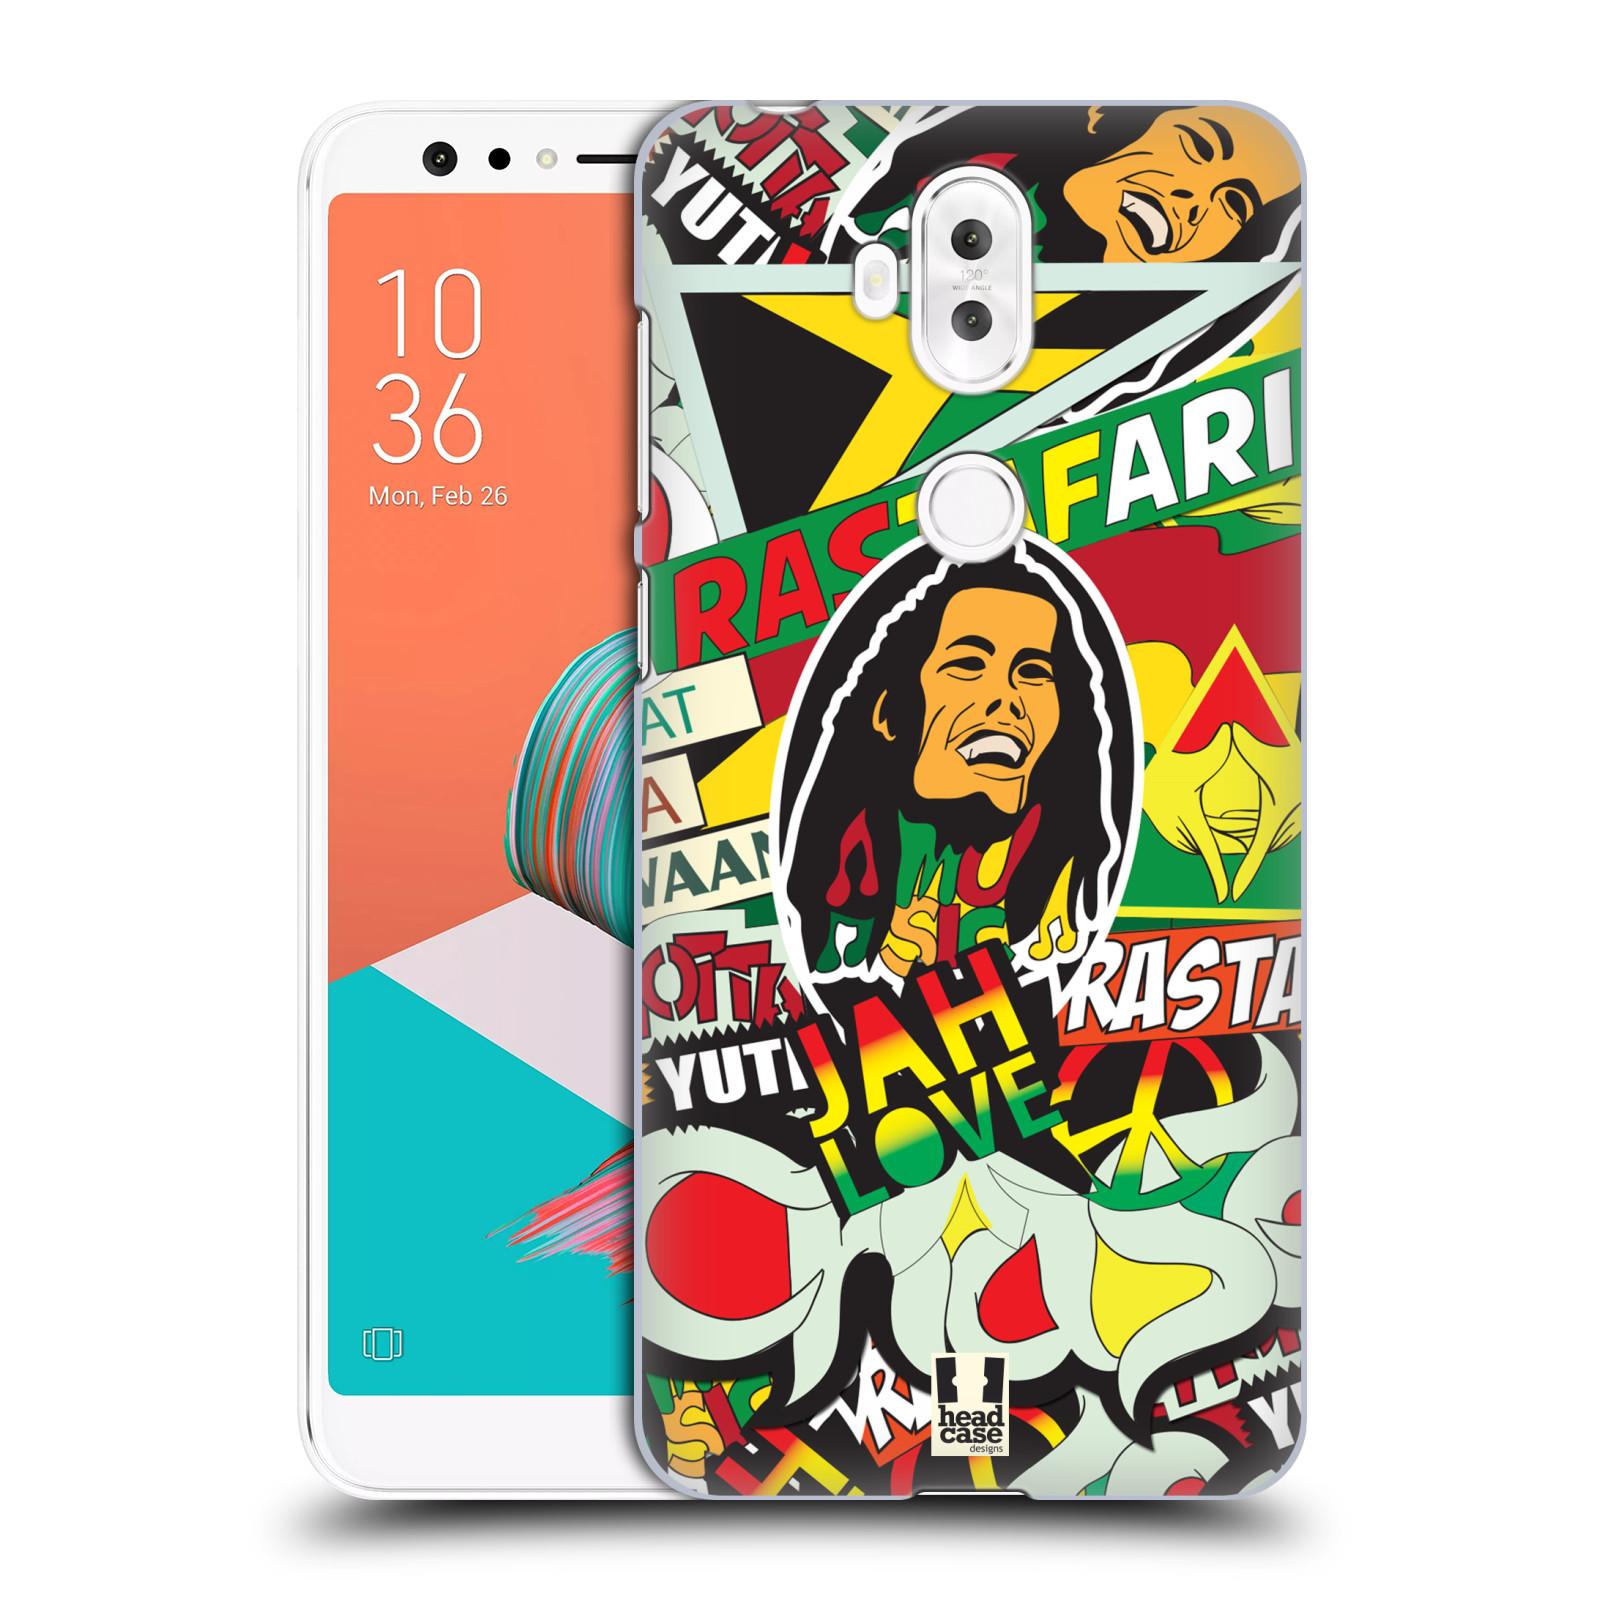 Plastové pouzdro na mobil Asus ZenFone 5 Lite ZC600KL - Head Case - RASTA (Plastový kryt či obal na mobilní telefon Asus ZenFone 5 Lite (ZC600KL) s motivem RASTA )